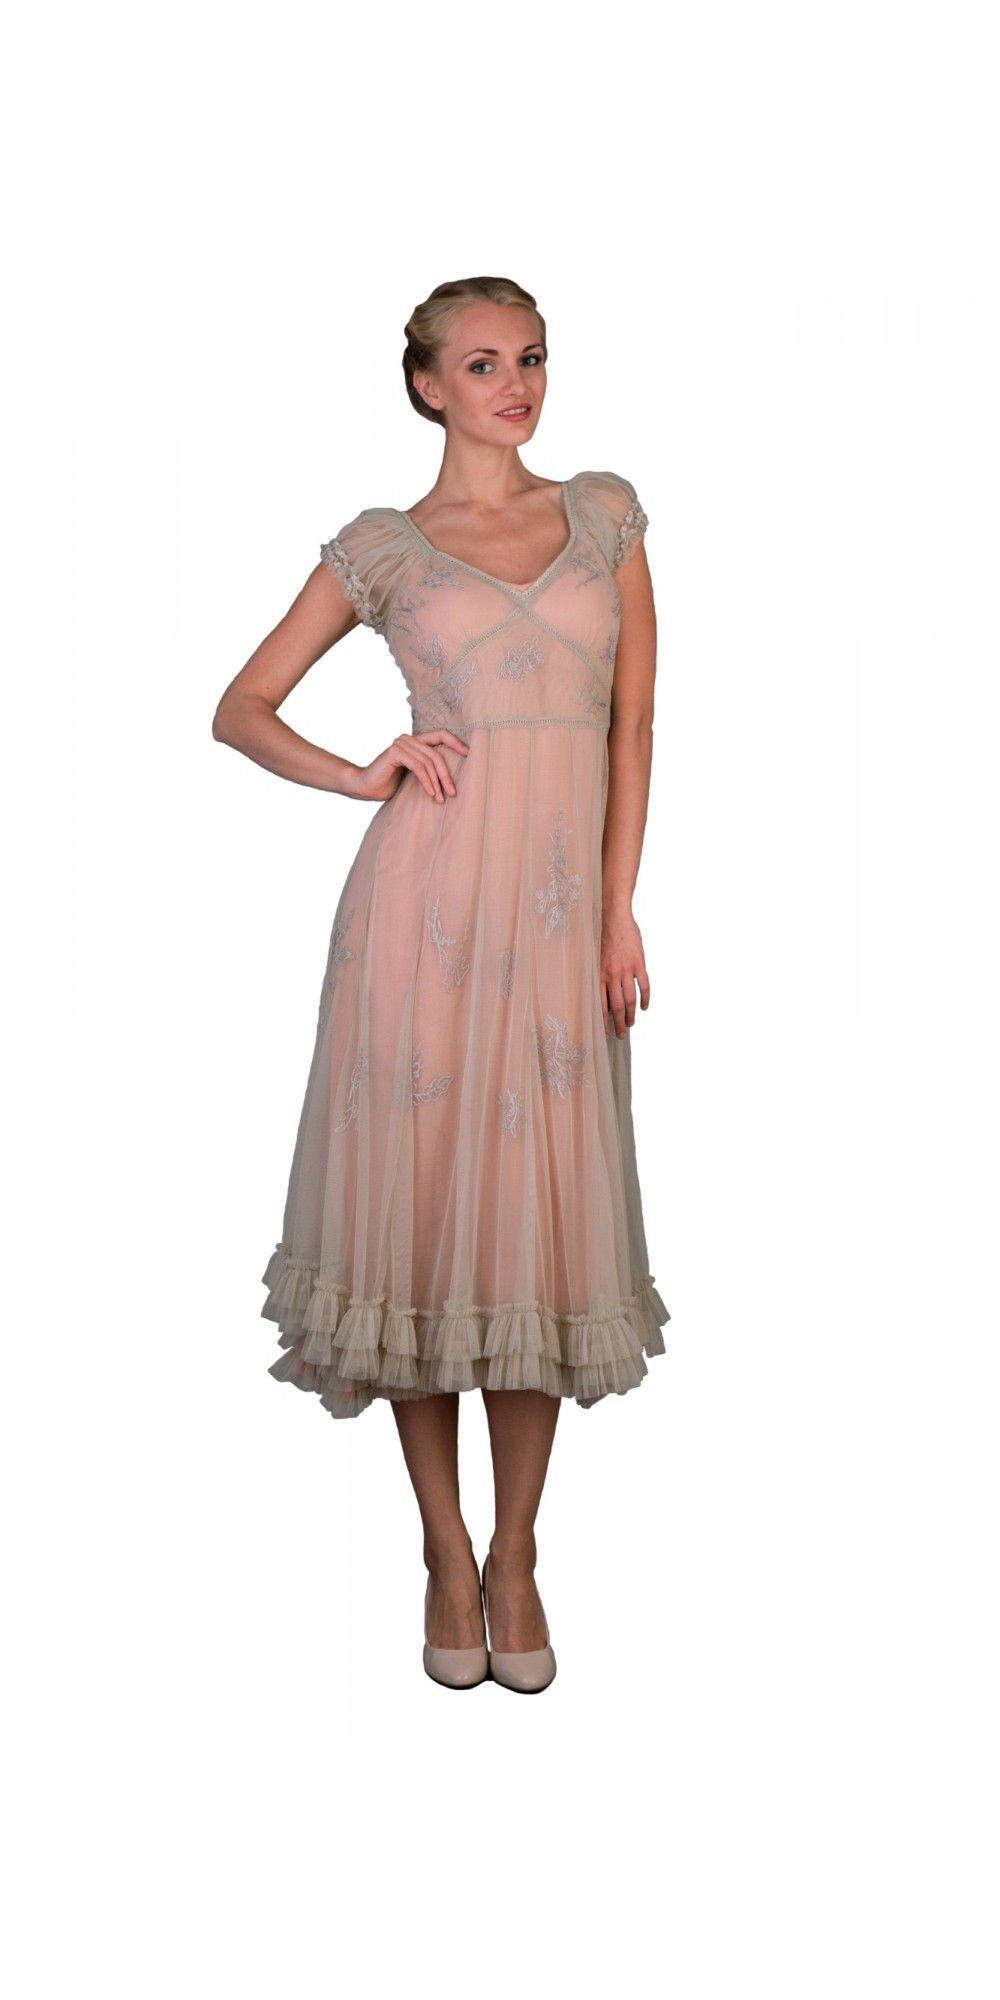 Ballerina tea party dress in antique pink by nataya vintage